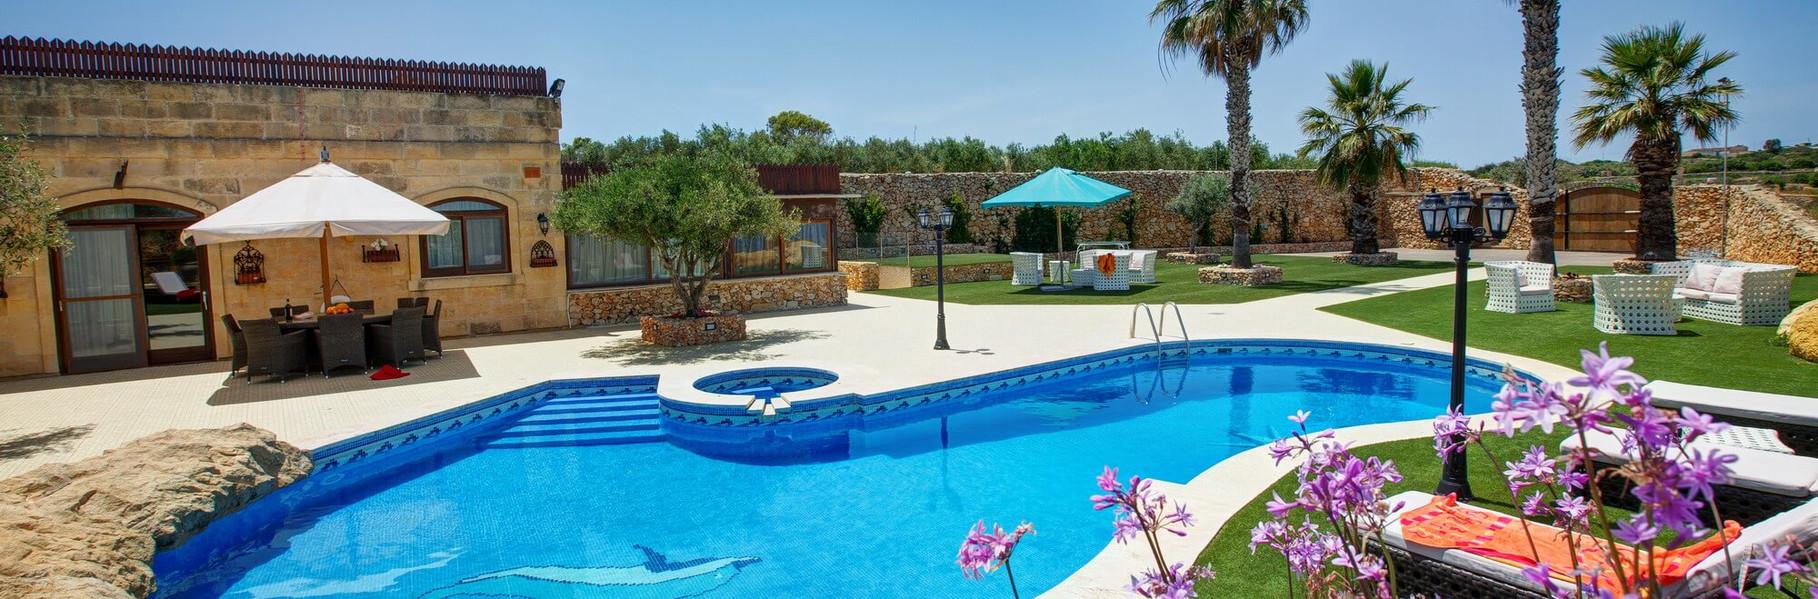 pool-farmhouse-villa-1.jpg